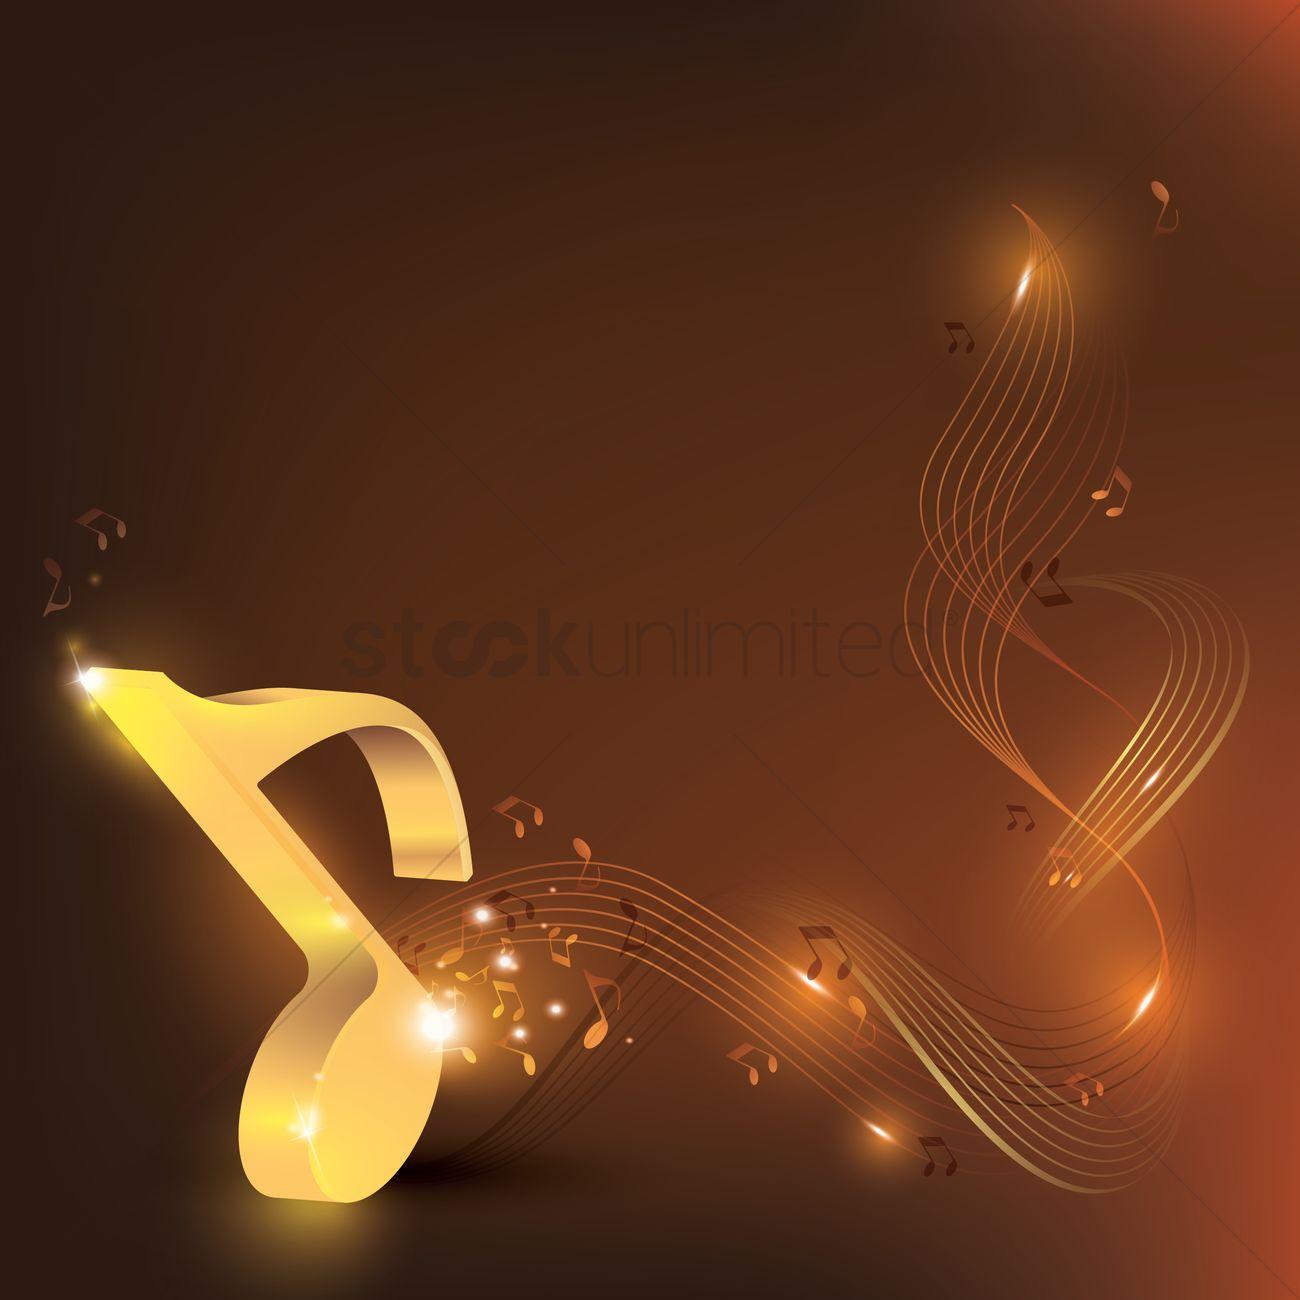 Musical Background Design Vector Image 1994447